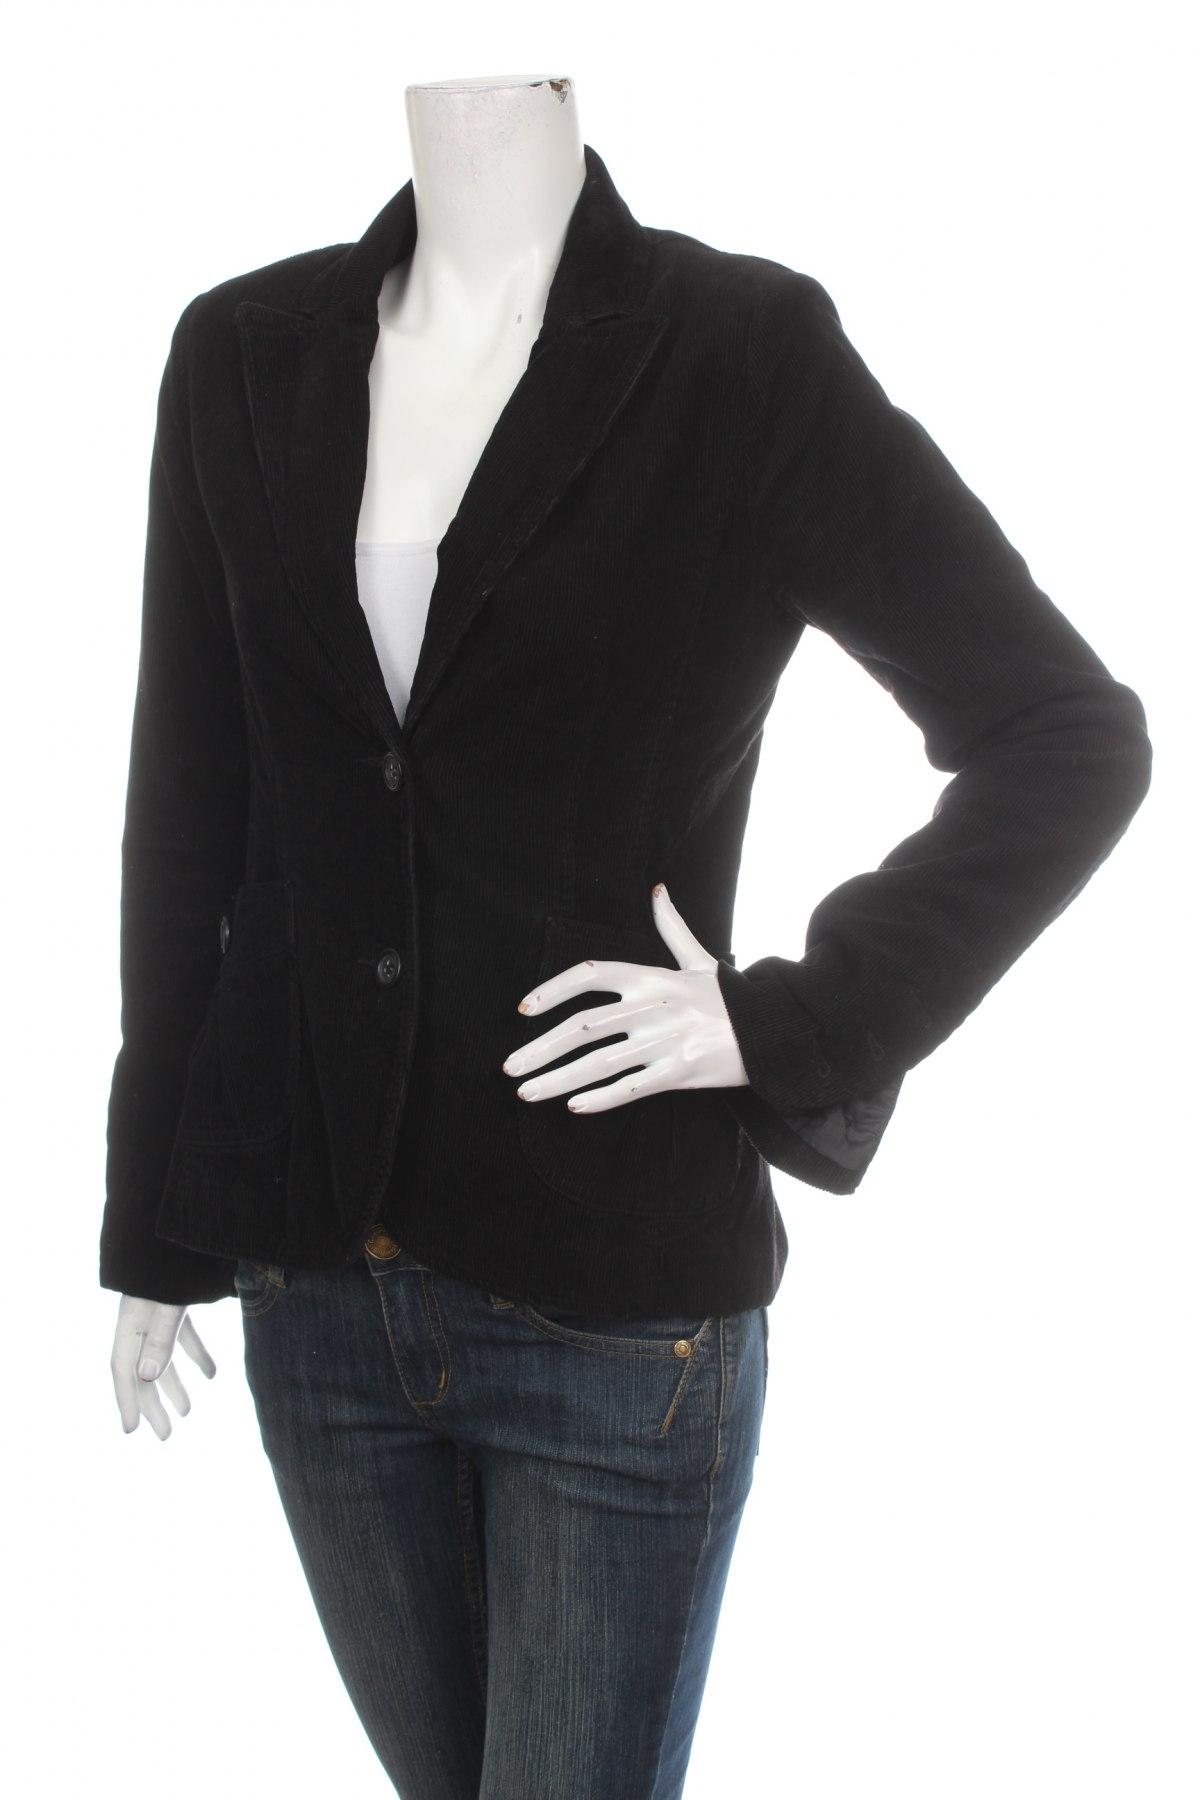 2db7d340840c Γυναικείο σακάκι H M - αγοράστε σε τιμή που συμφέρει στο Remix ...